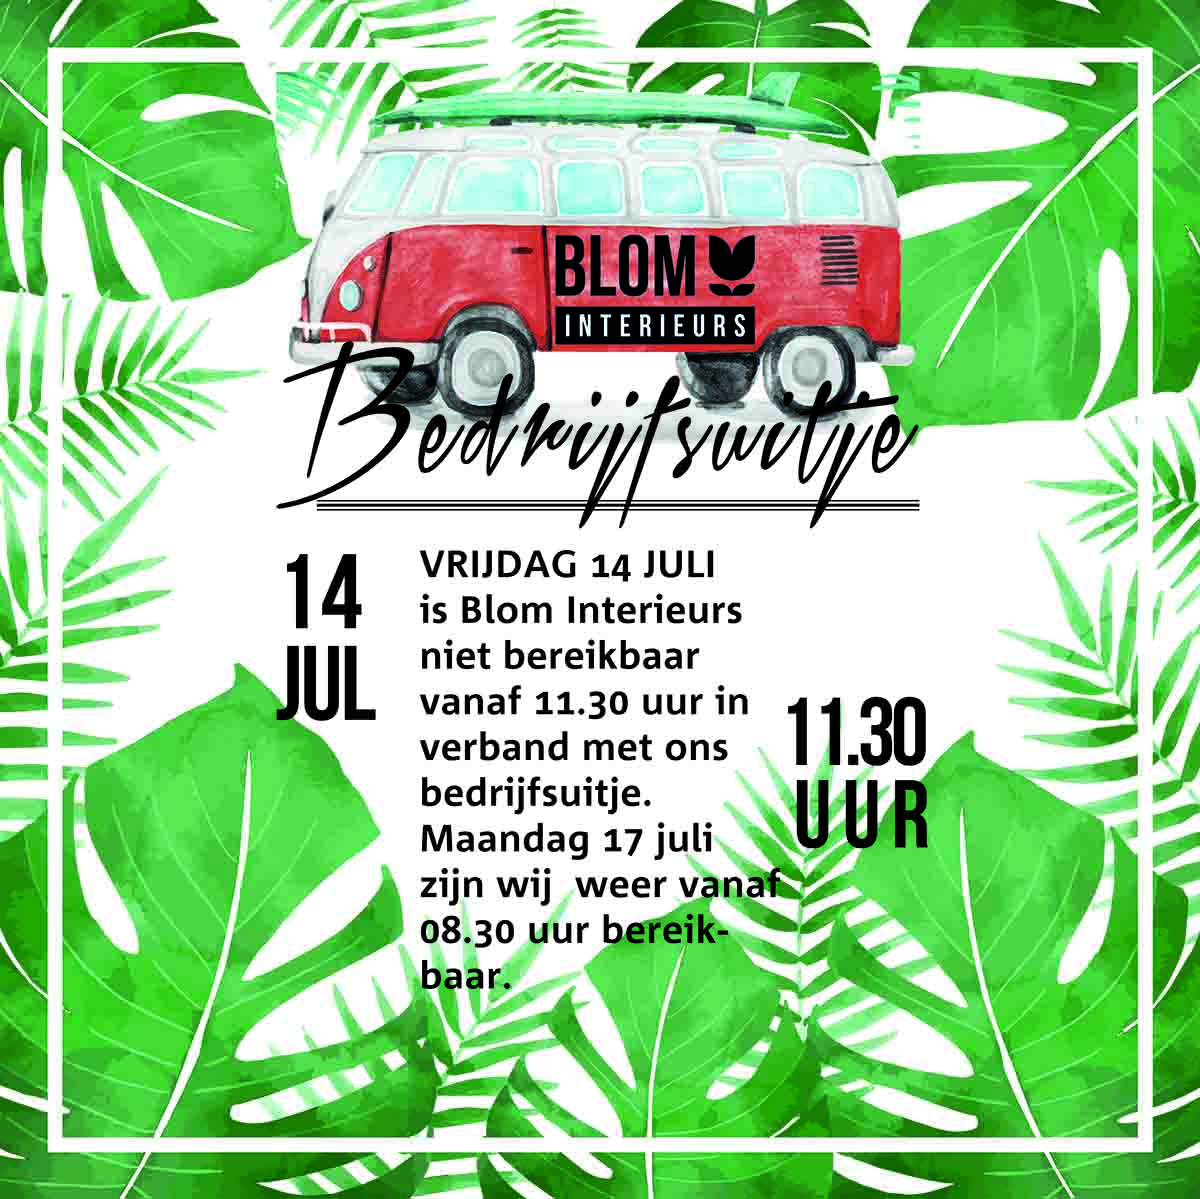 Bedrijfsuitje Blom Interieurs 14 juli a.s.